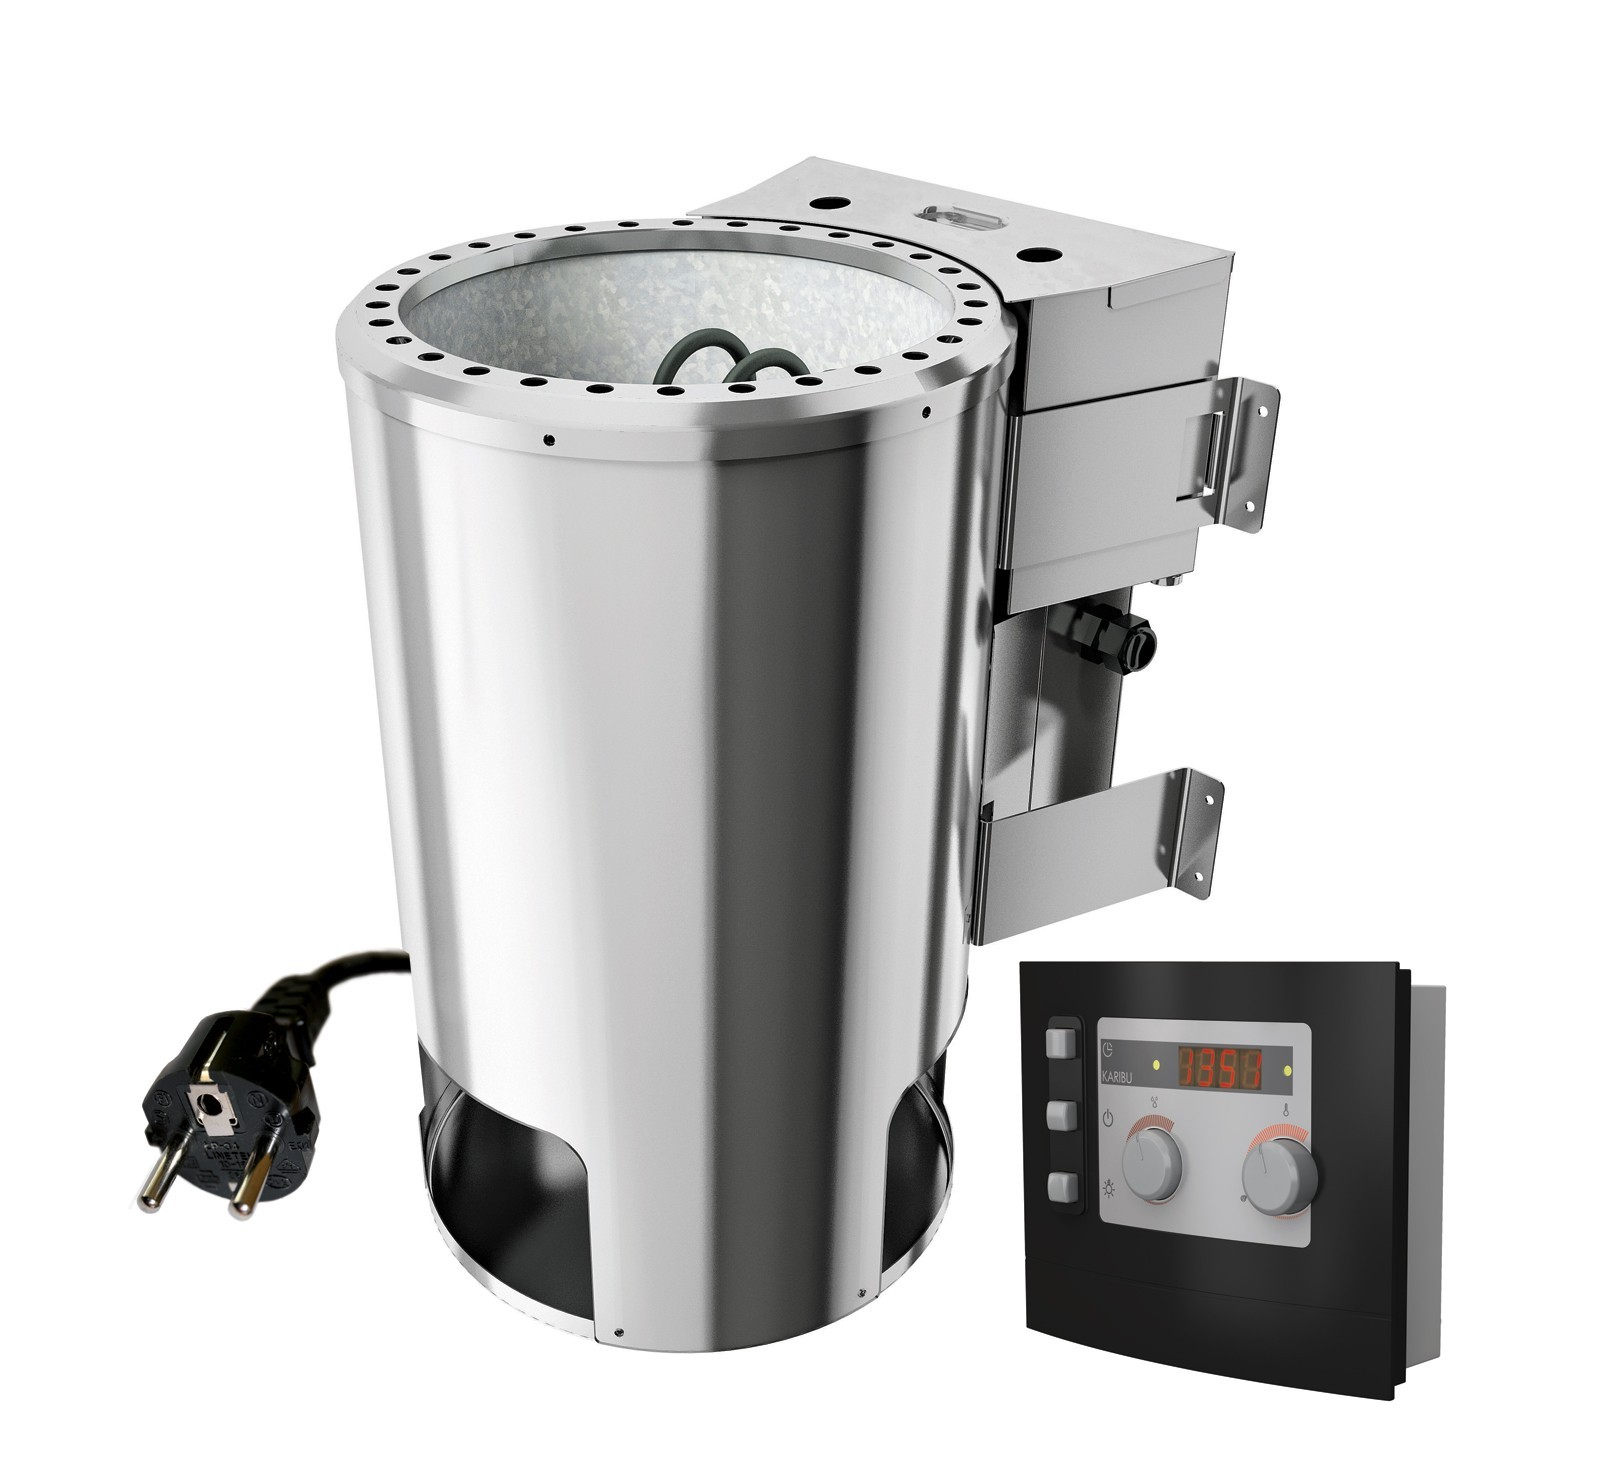 Saunaofen BIO Kombi Plug & Play 230V Karibu mit ext. Steuerung Modern Bild 1